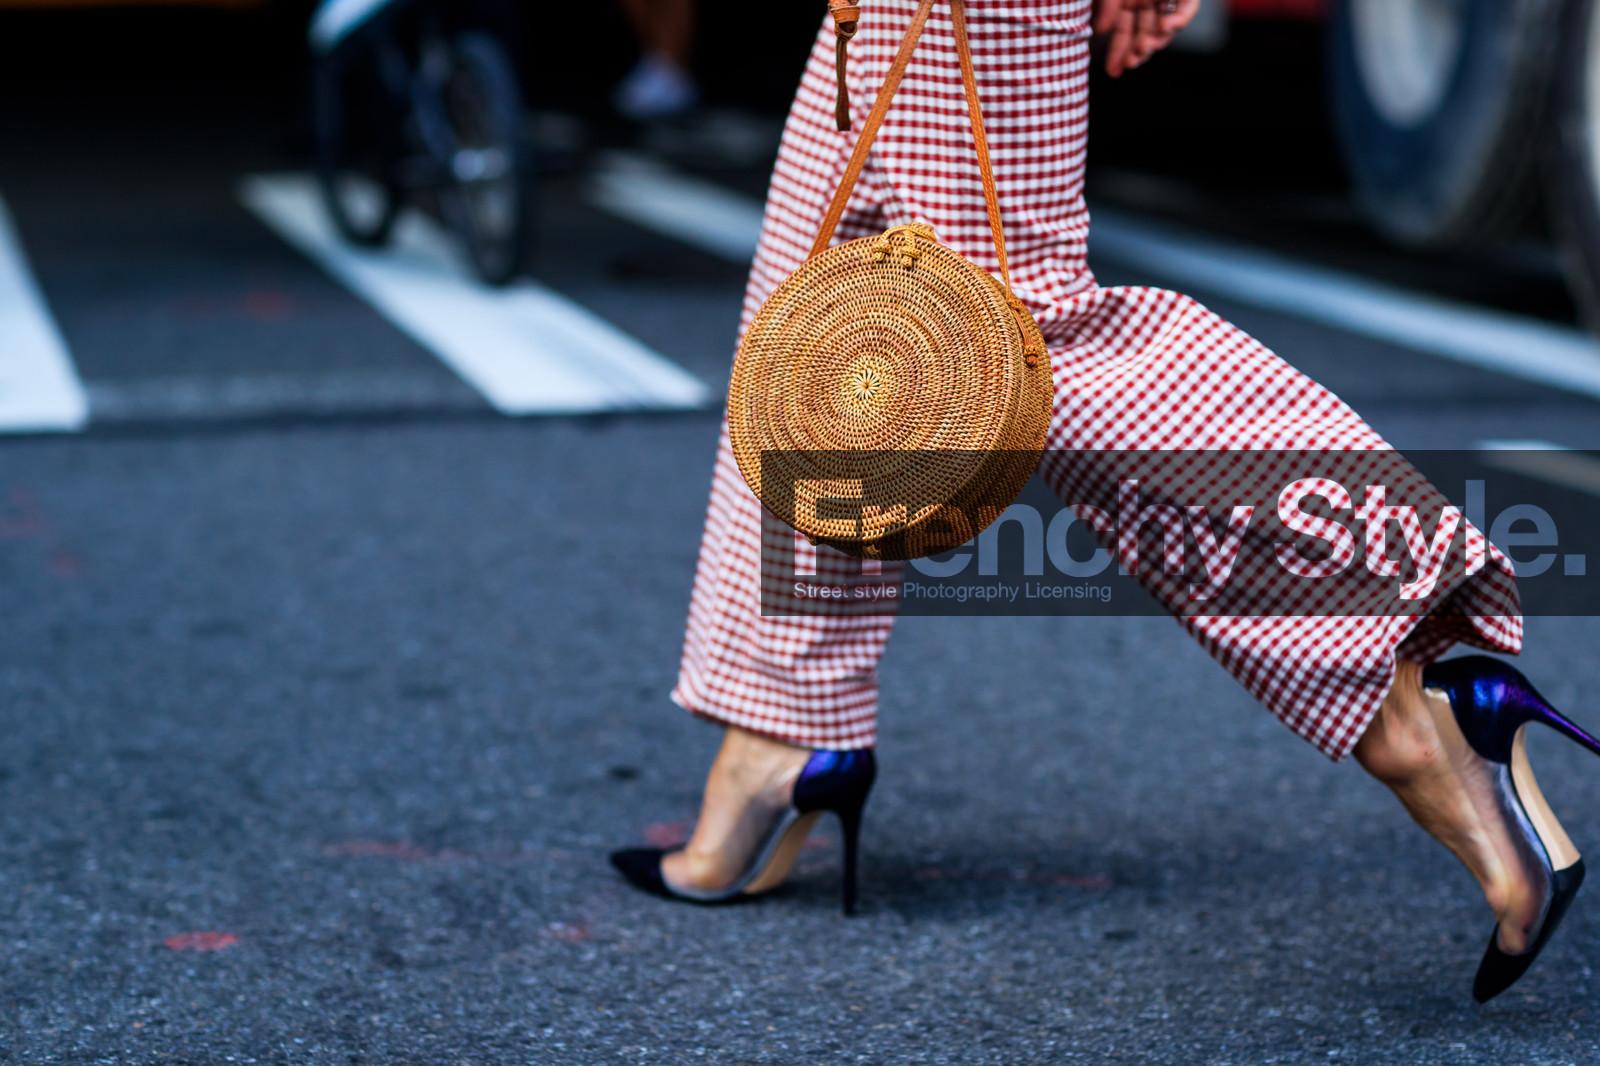 aa066be7fb9 1709NY0088.jpg | Frenchy Style | Street Style by Jonathan Paciullo